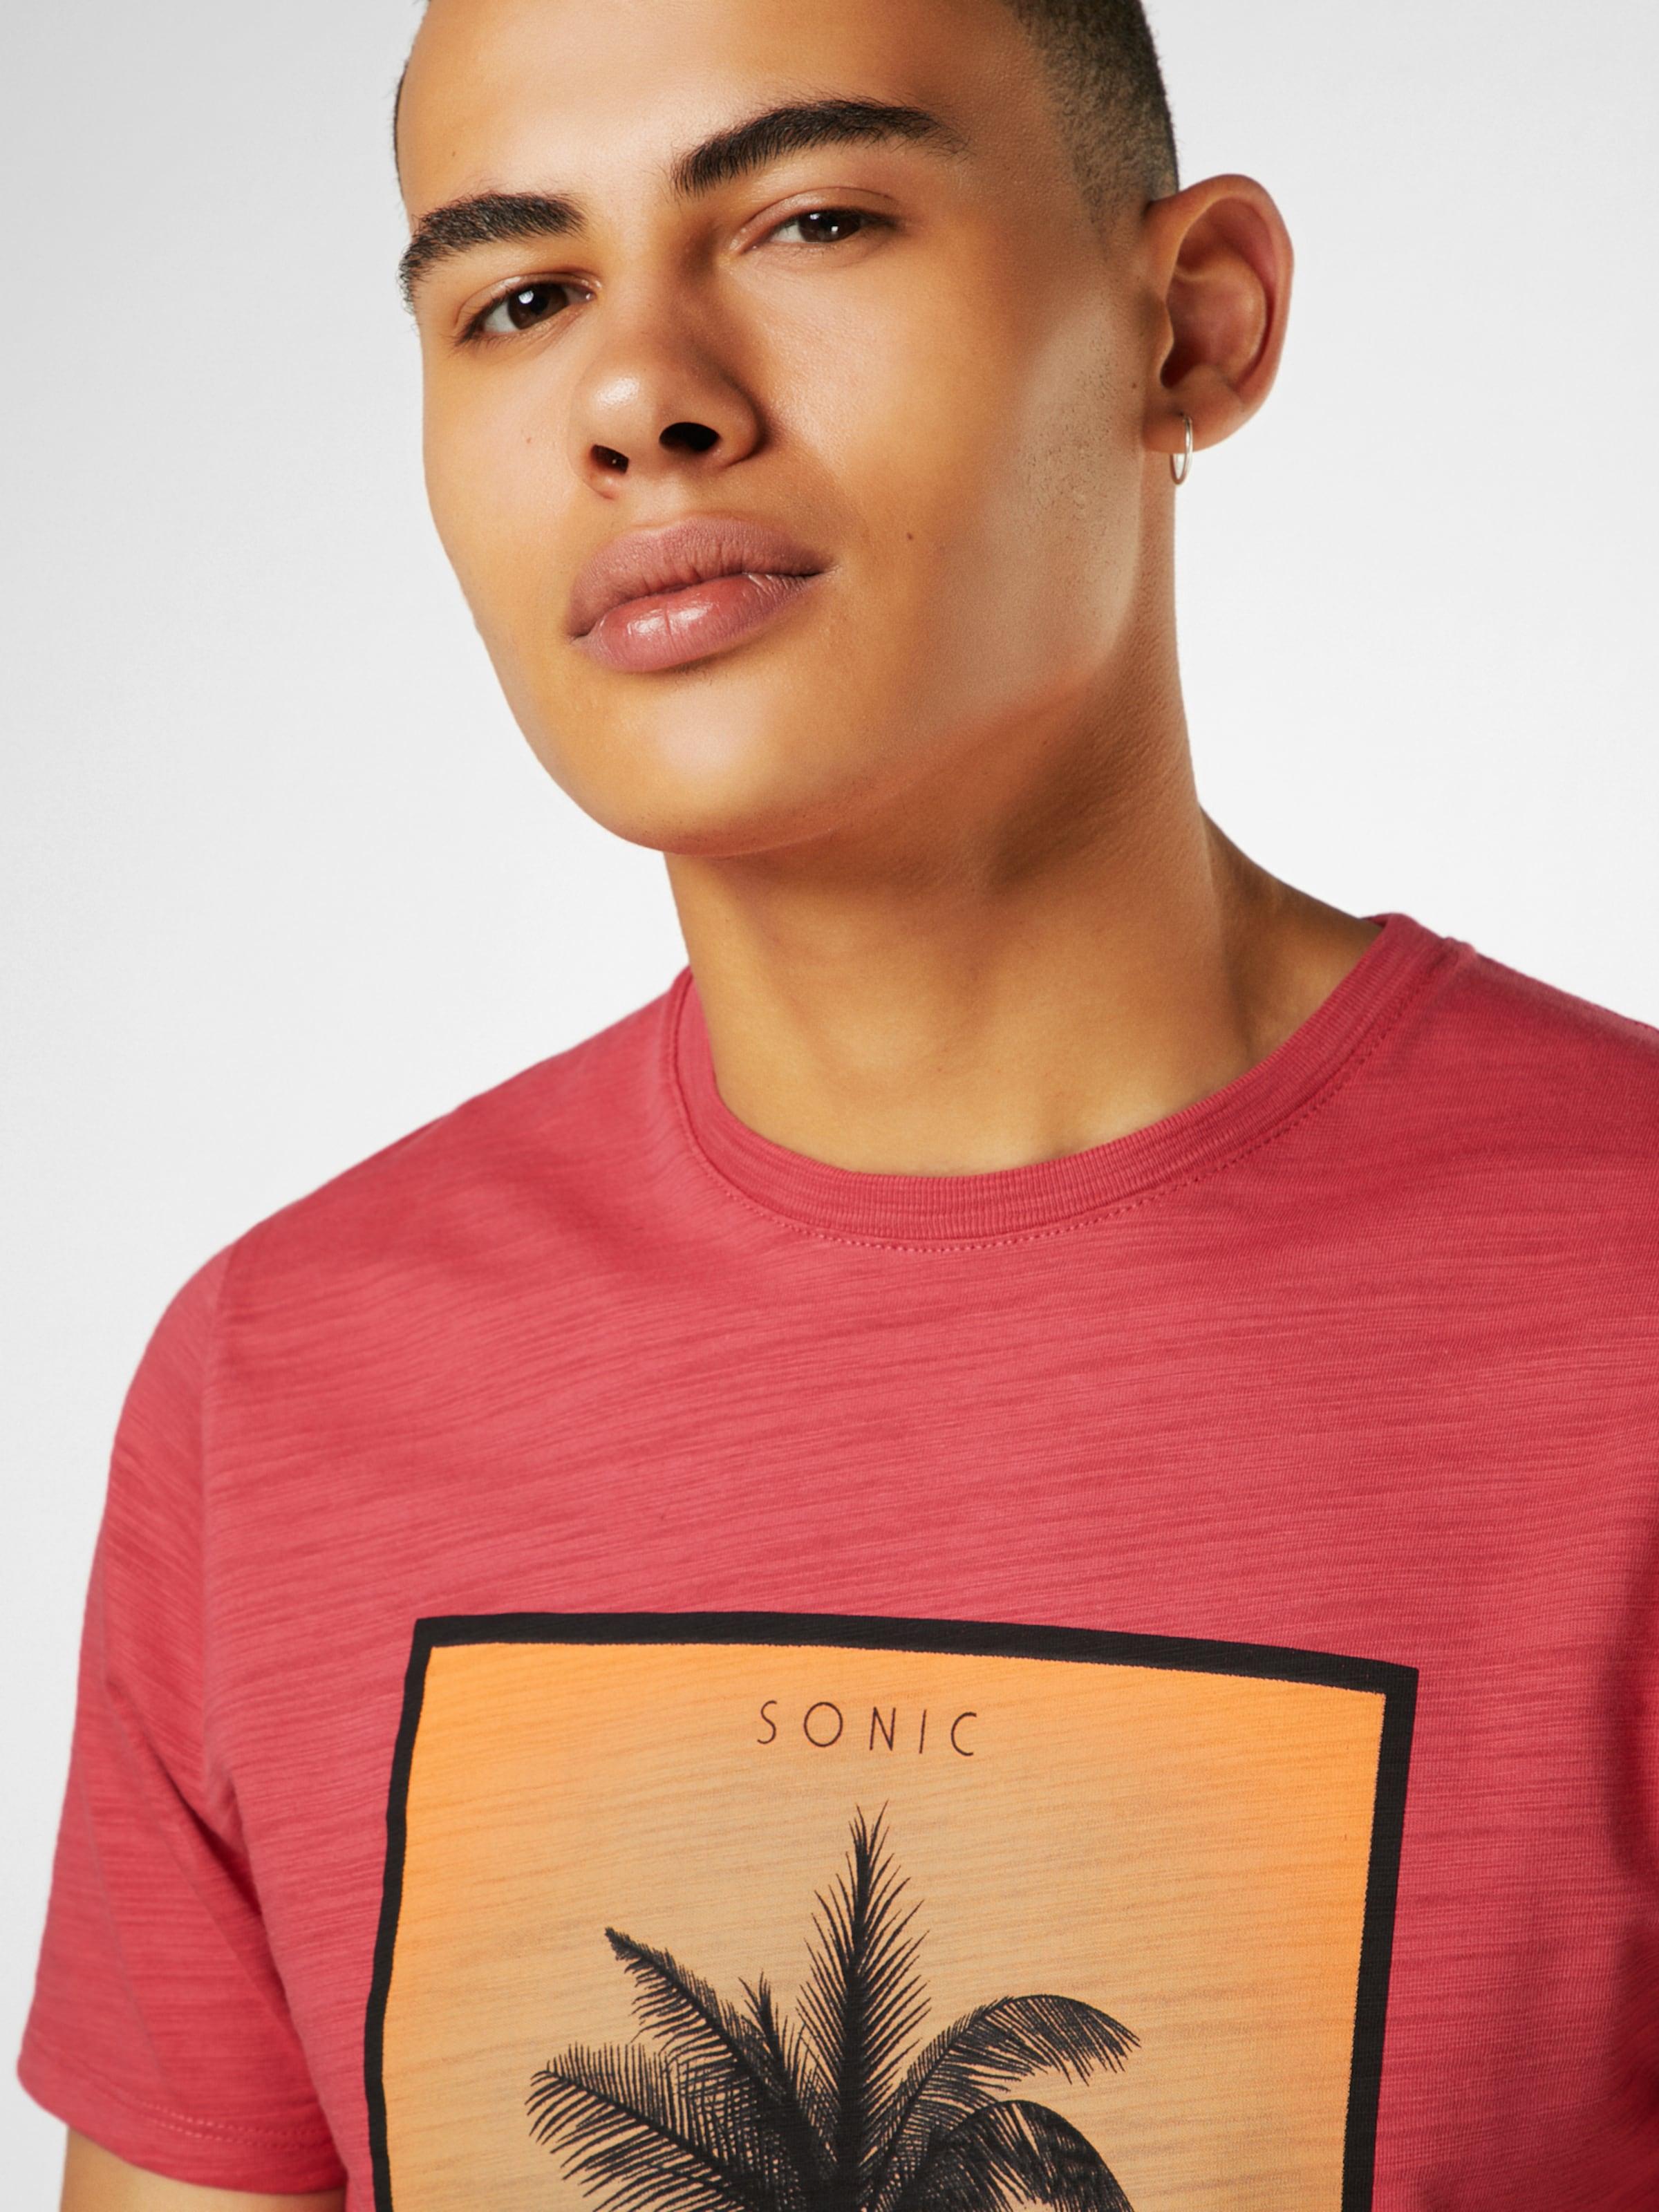 T shirt' En O'neill T 'lm CielMelon shirt Sonic Bleu myNnOv80w